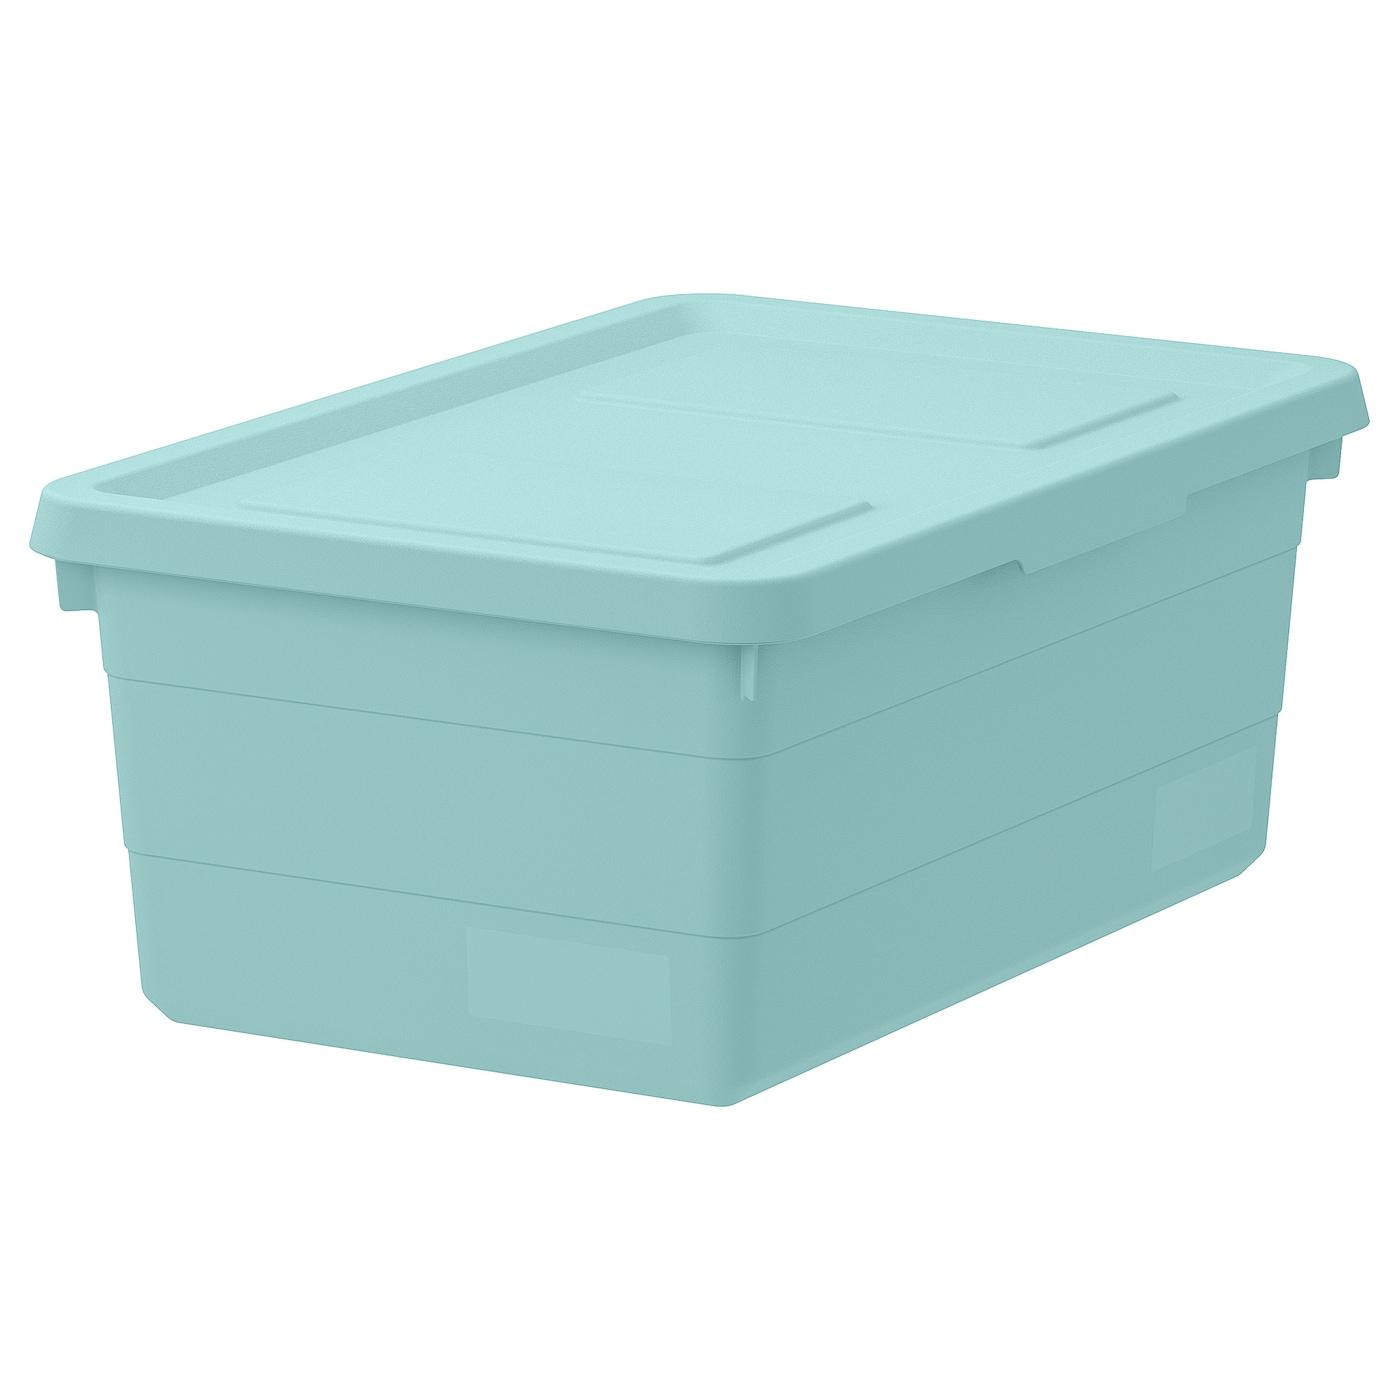 SOCKERBIT Storage box with lid, light blue - Buy online or in-store